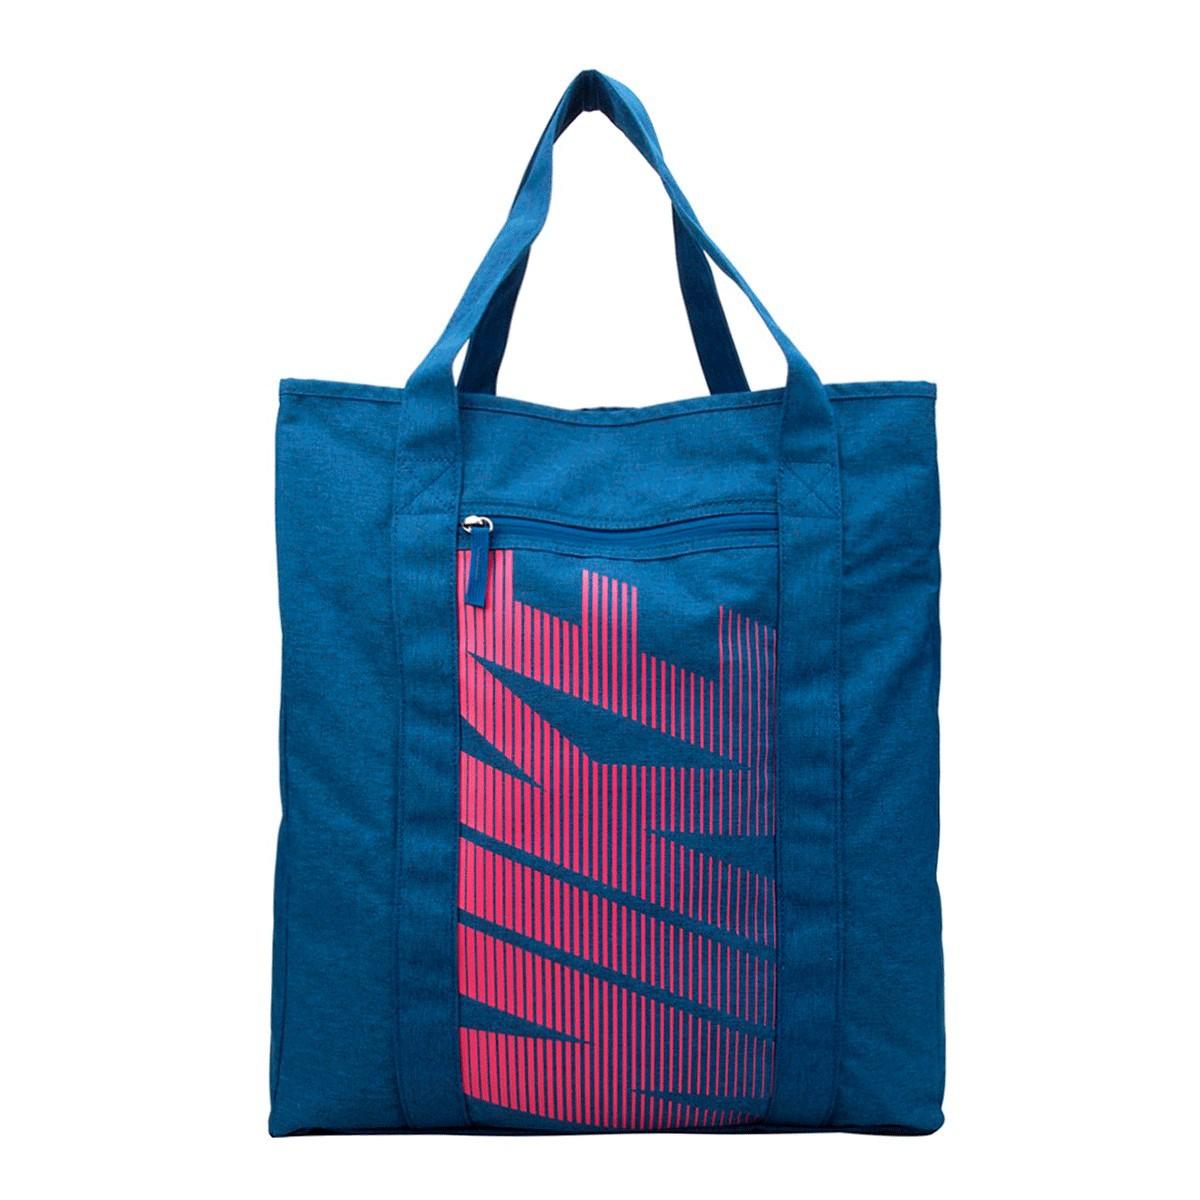 Bolsa Nike Gym Tote Feminina Azul